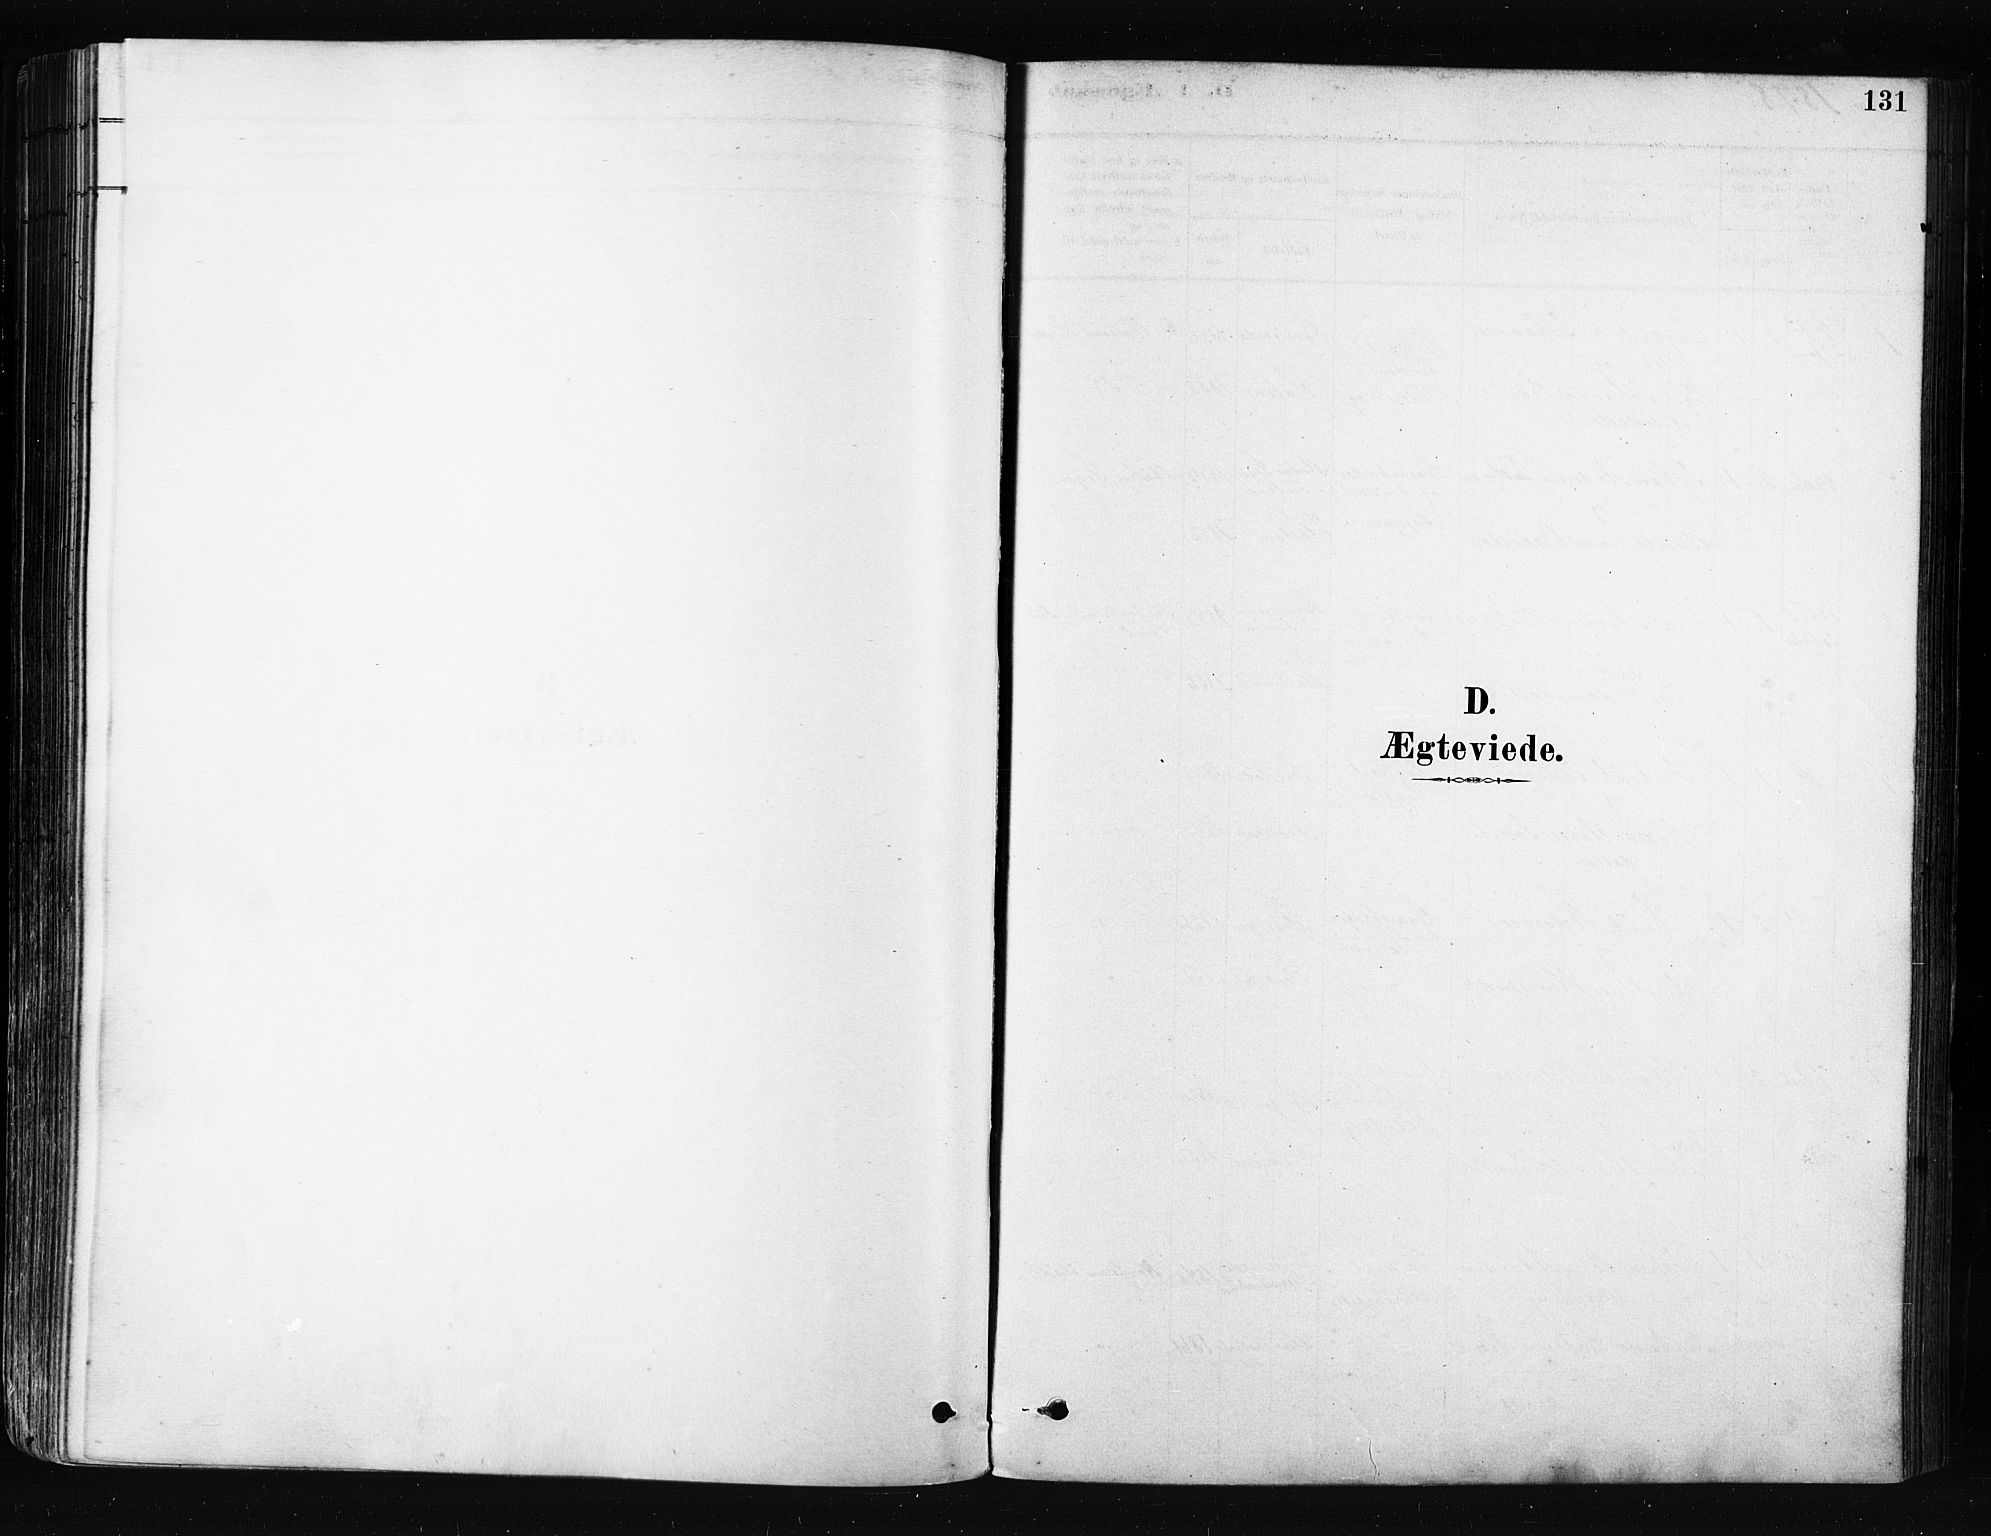 SATØ, Skjervøy sokneprestkontor, H/Ha/Haa/L0014kirke: Ministerialbok nr. 14, 1878-1894, s. 131